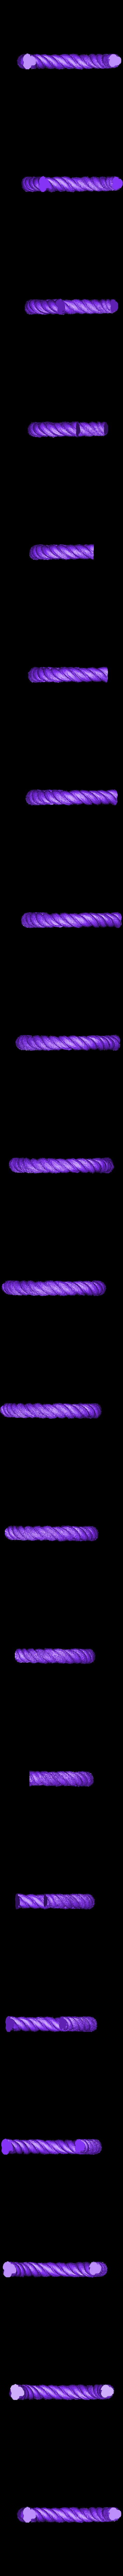 411 Noose 4.stl Download free STL file Noose (Season 4, Episode 11) • Design to 3D print, 3DBROOKLYN